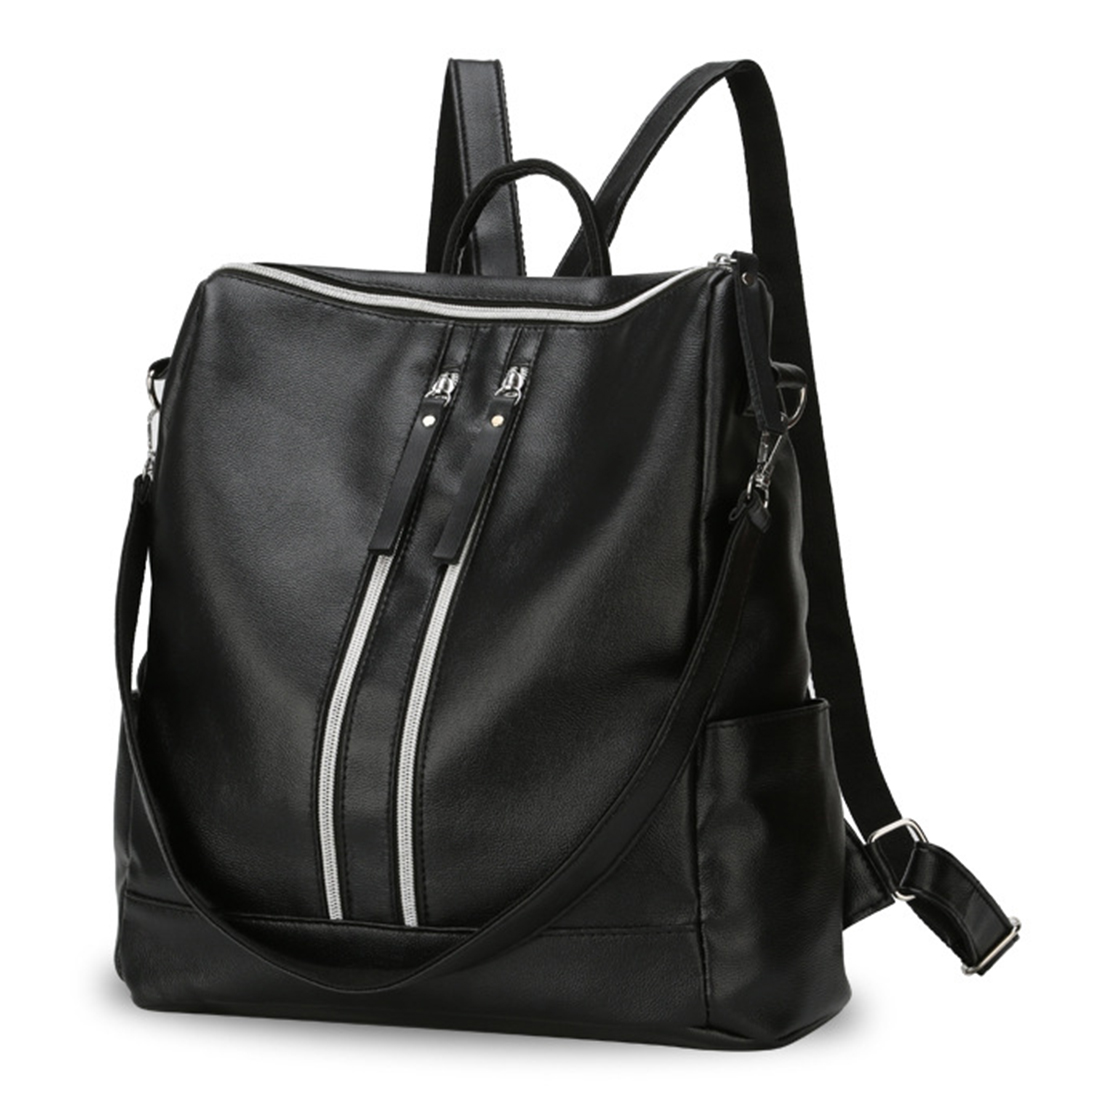 Women Backpack High Quality Youth Leather Backpacks for Teenage Girls Female School Shoulder Bag BagpackWomen Backpack High Quality Youth Leather Backpacks for Teenage Girls Female School Shoulder Bag Bagpack